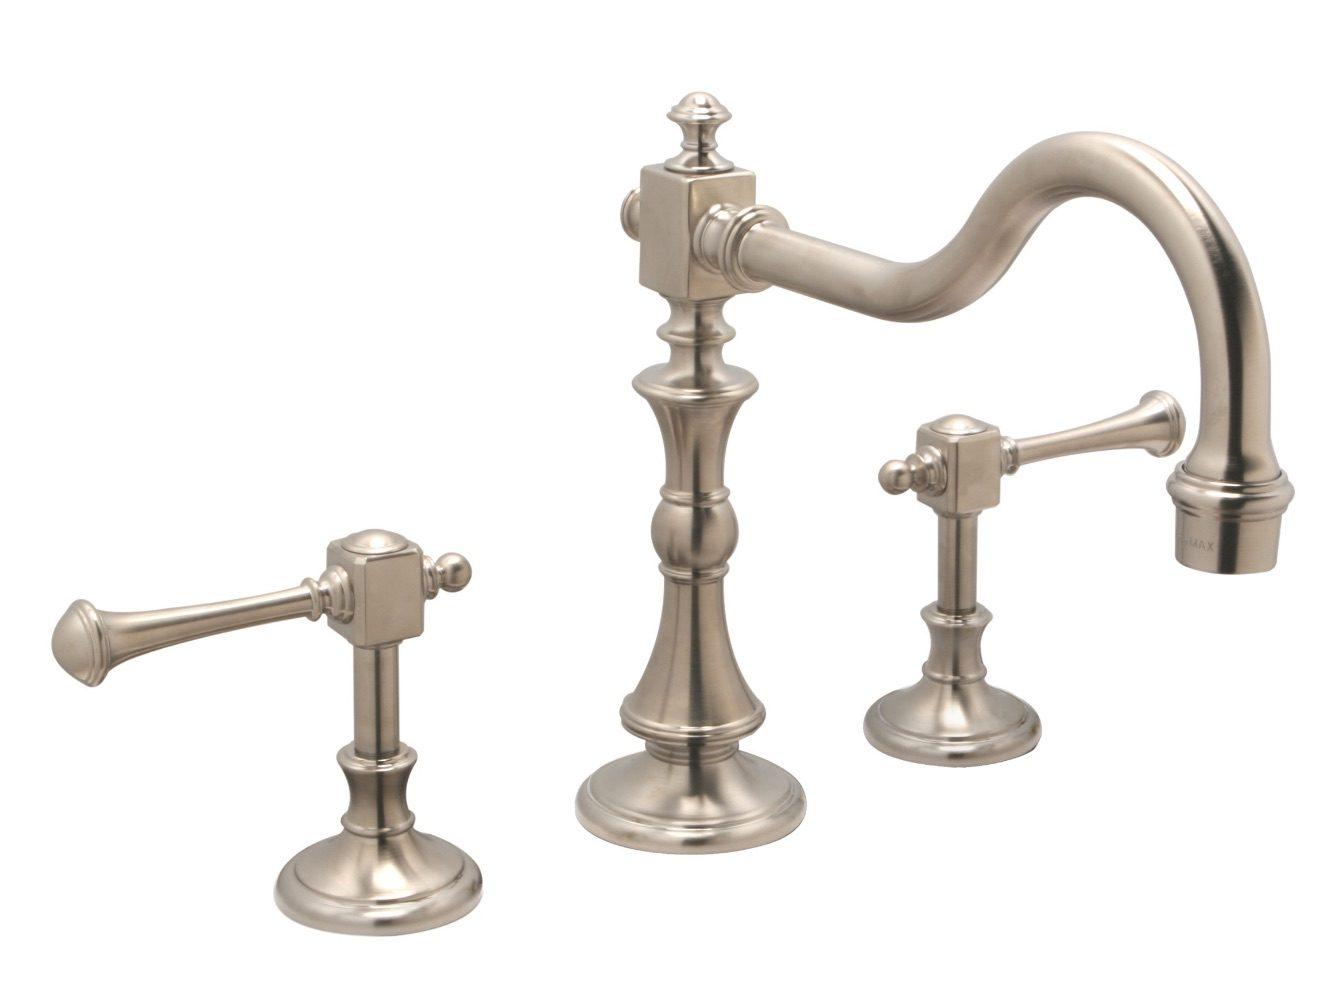 widespread kitchen faucet widespread kitchen faucet Huntington Brass Kitchen Faucets Wave Plumbing